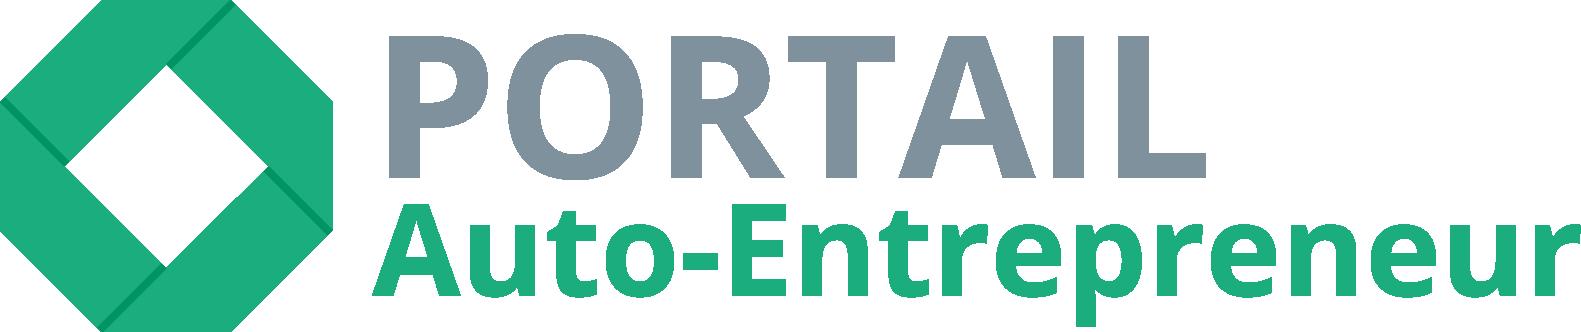 Logo portail autoentrepreneur